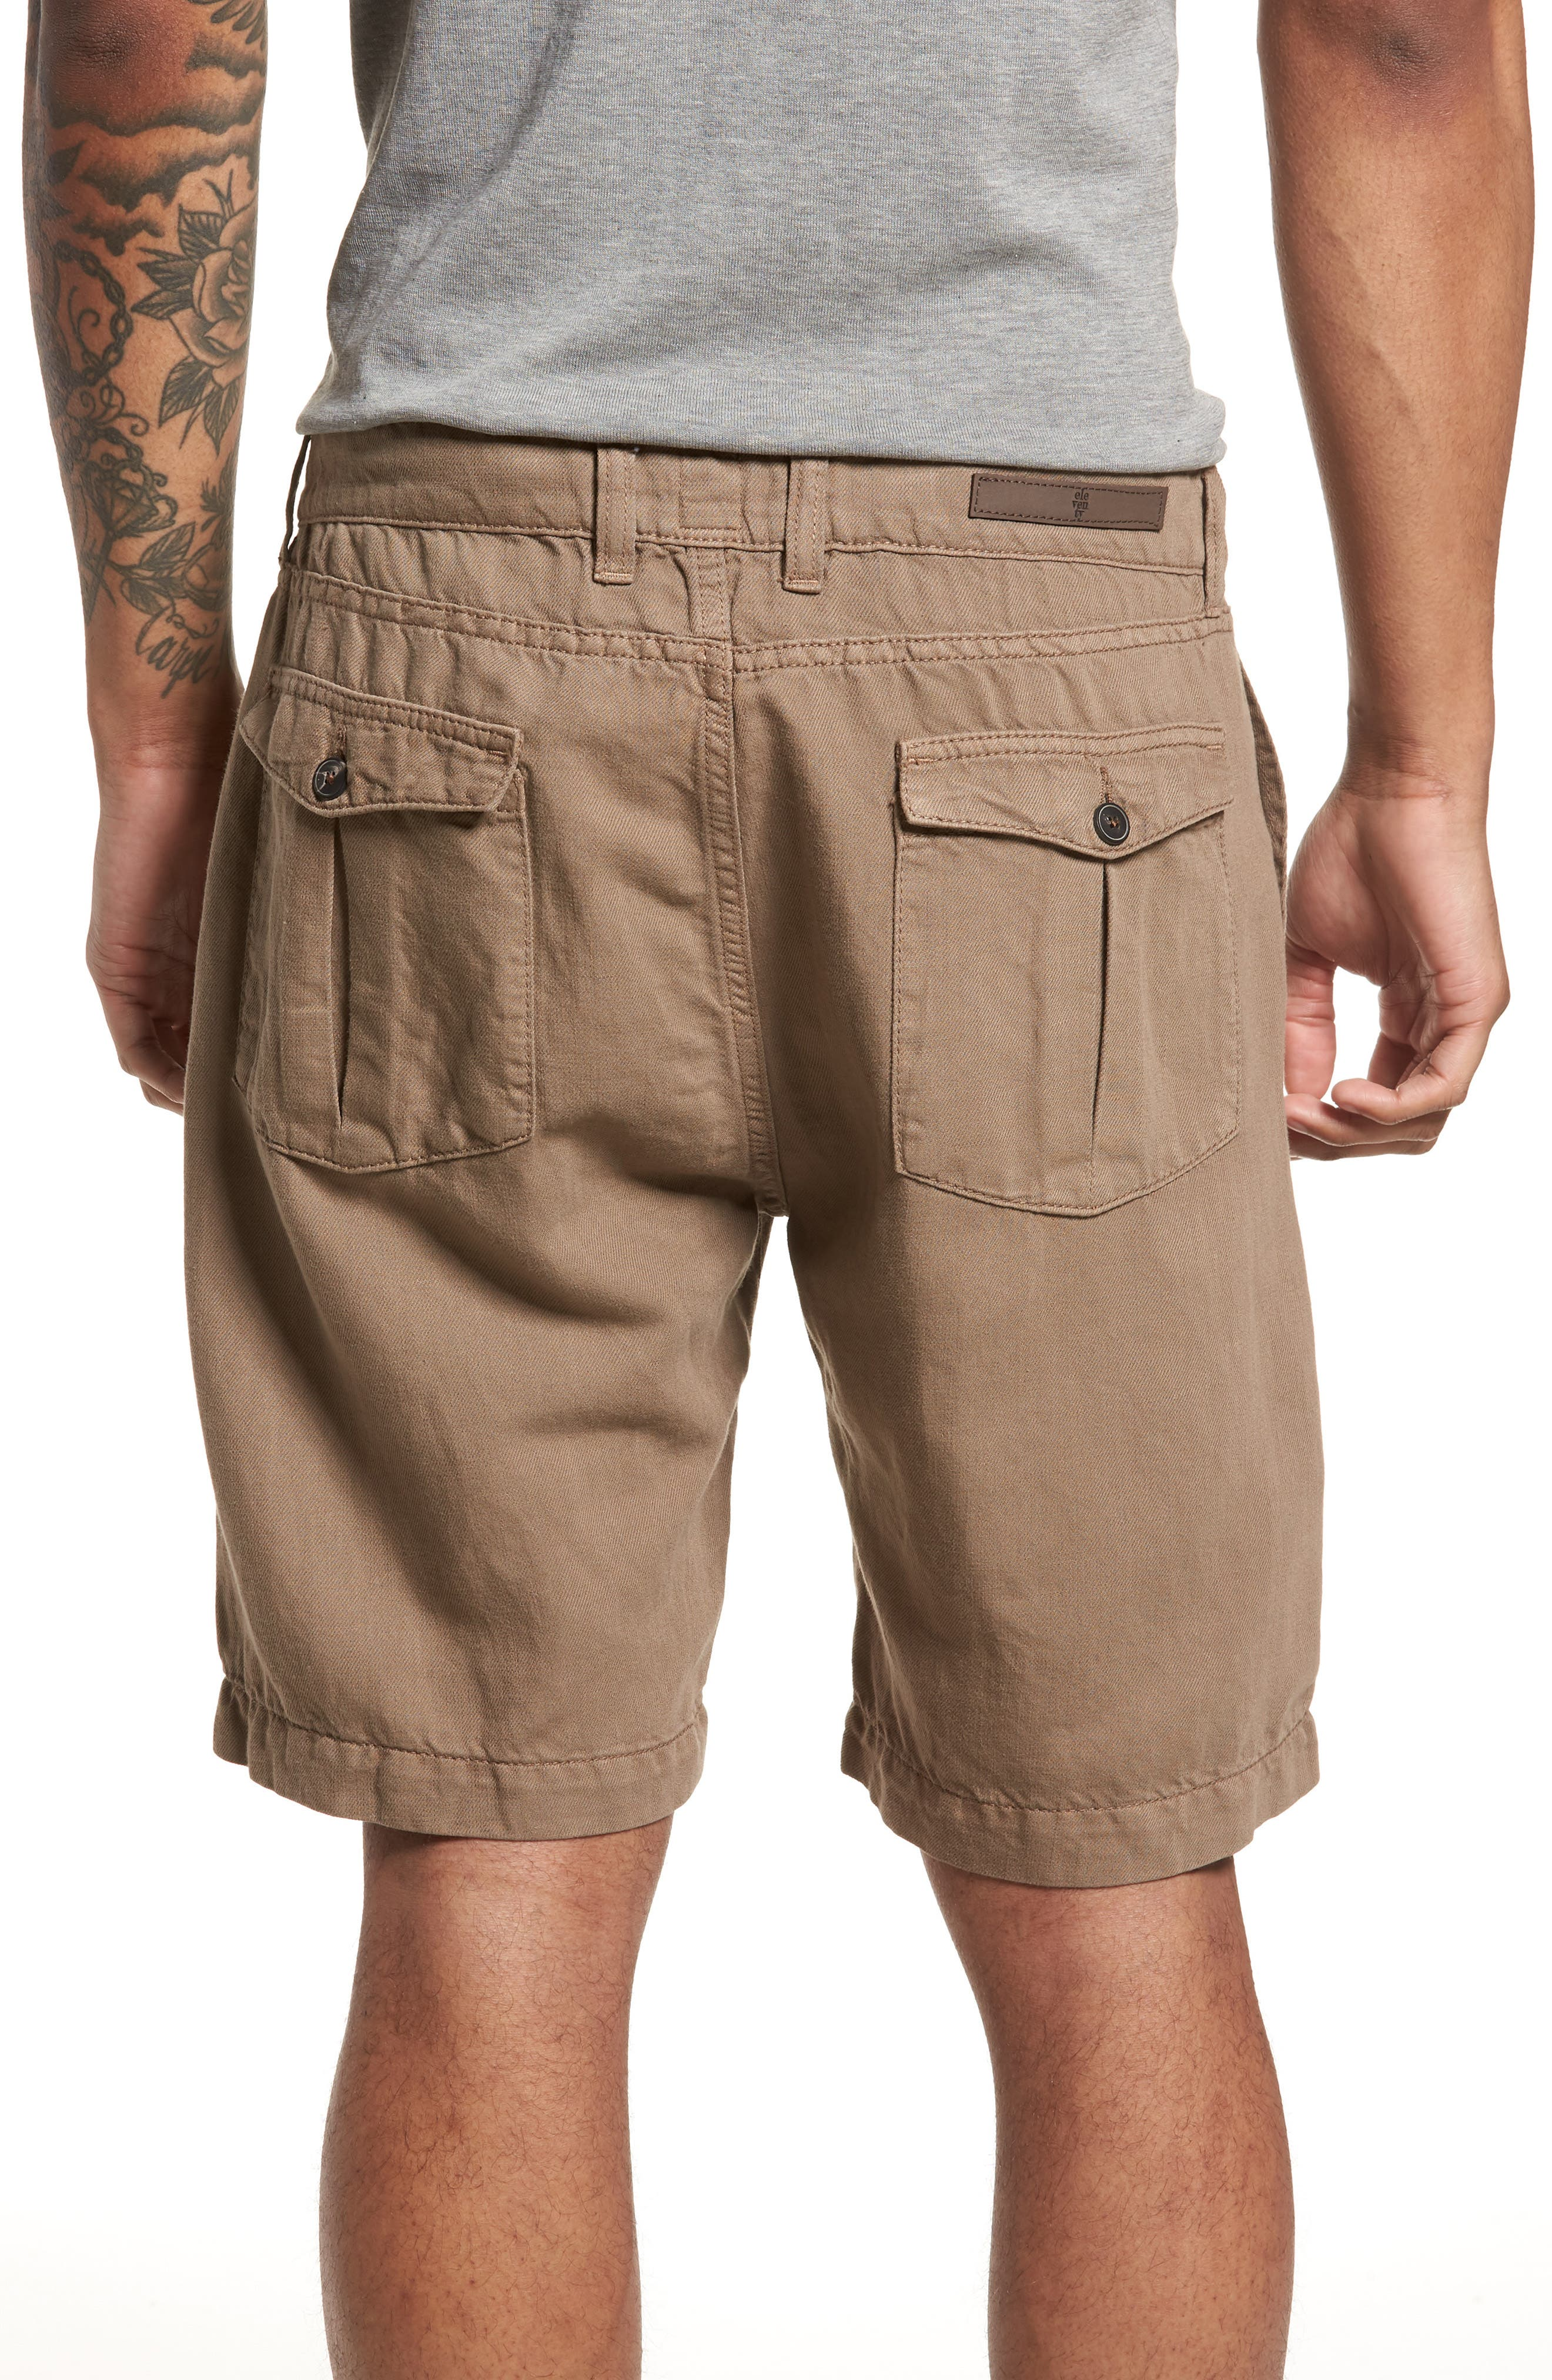 Fatique Bermuda Shorts,                             Alternate thumbnail 2, color,                             Taupe